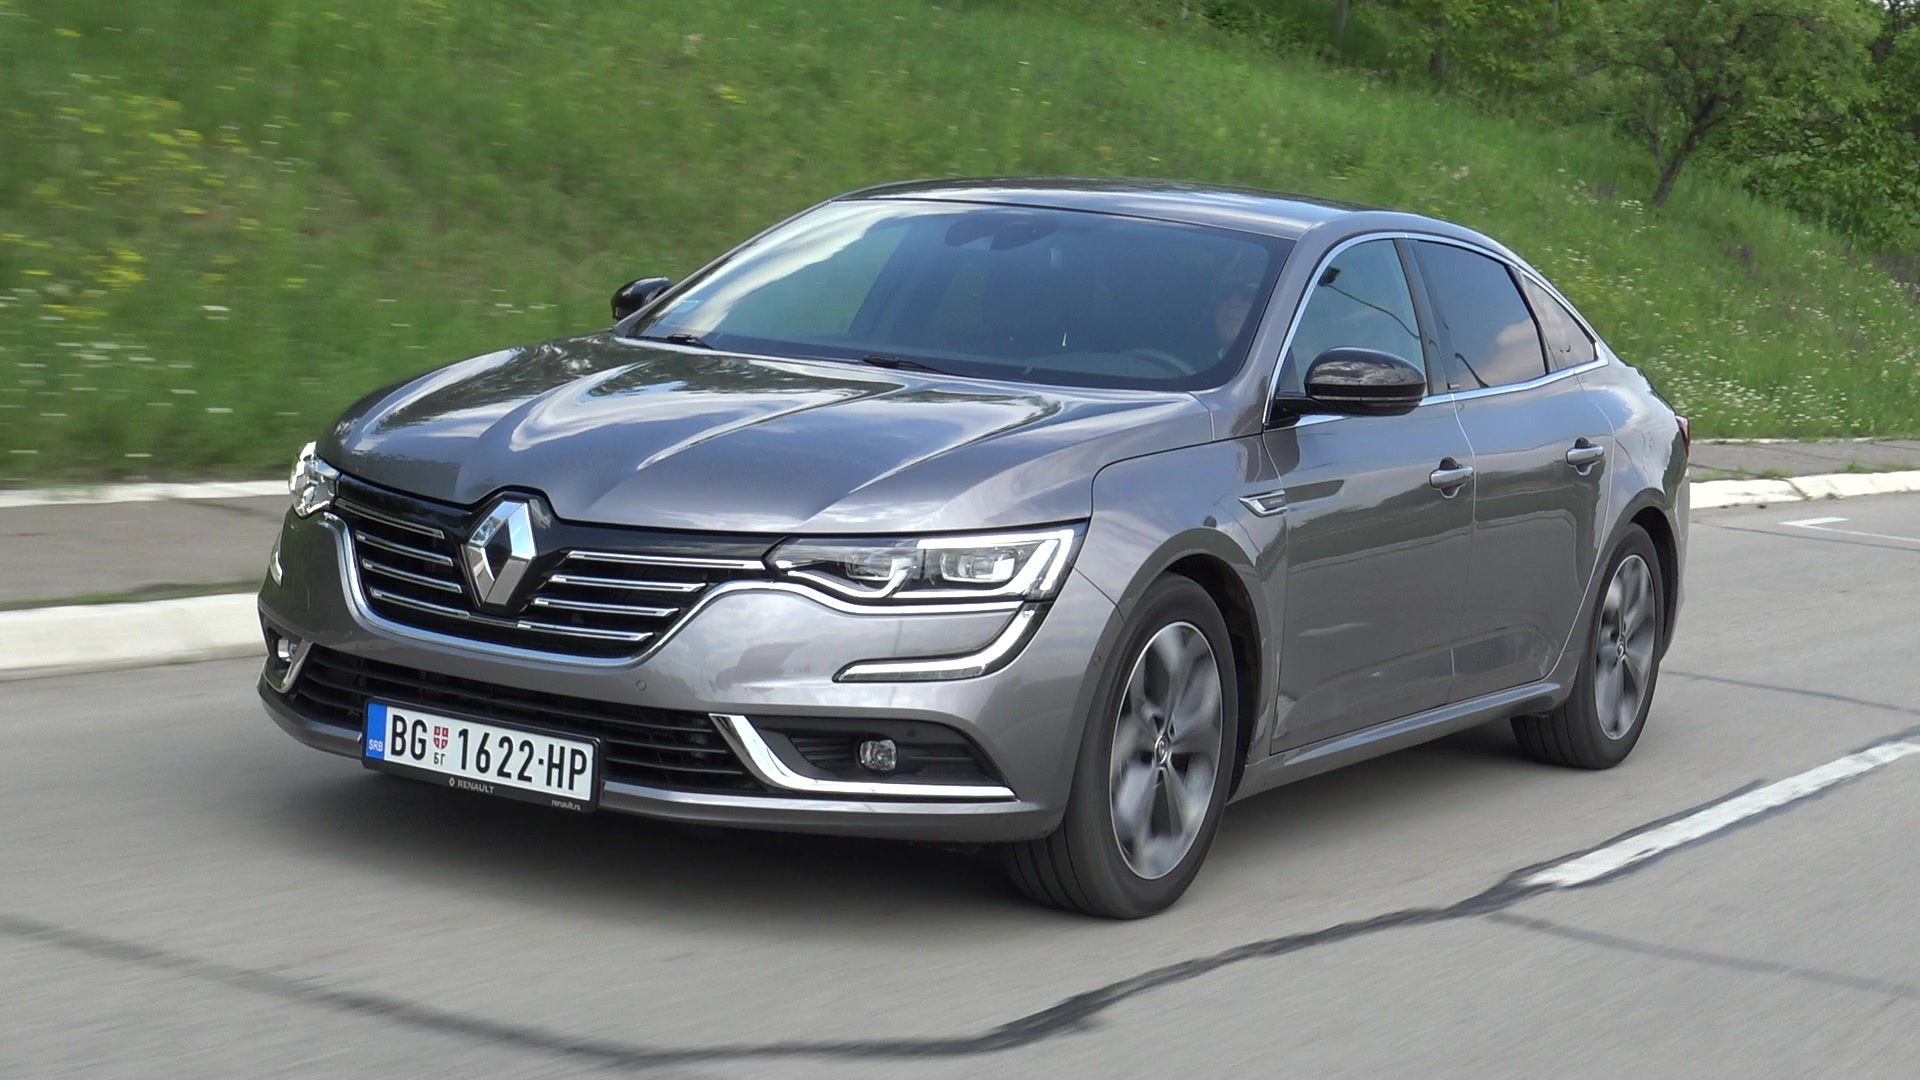 Renault Talisman 2.0 Blue dCi 200 S-Edition